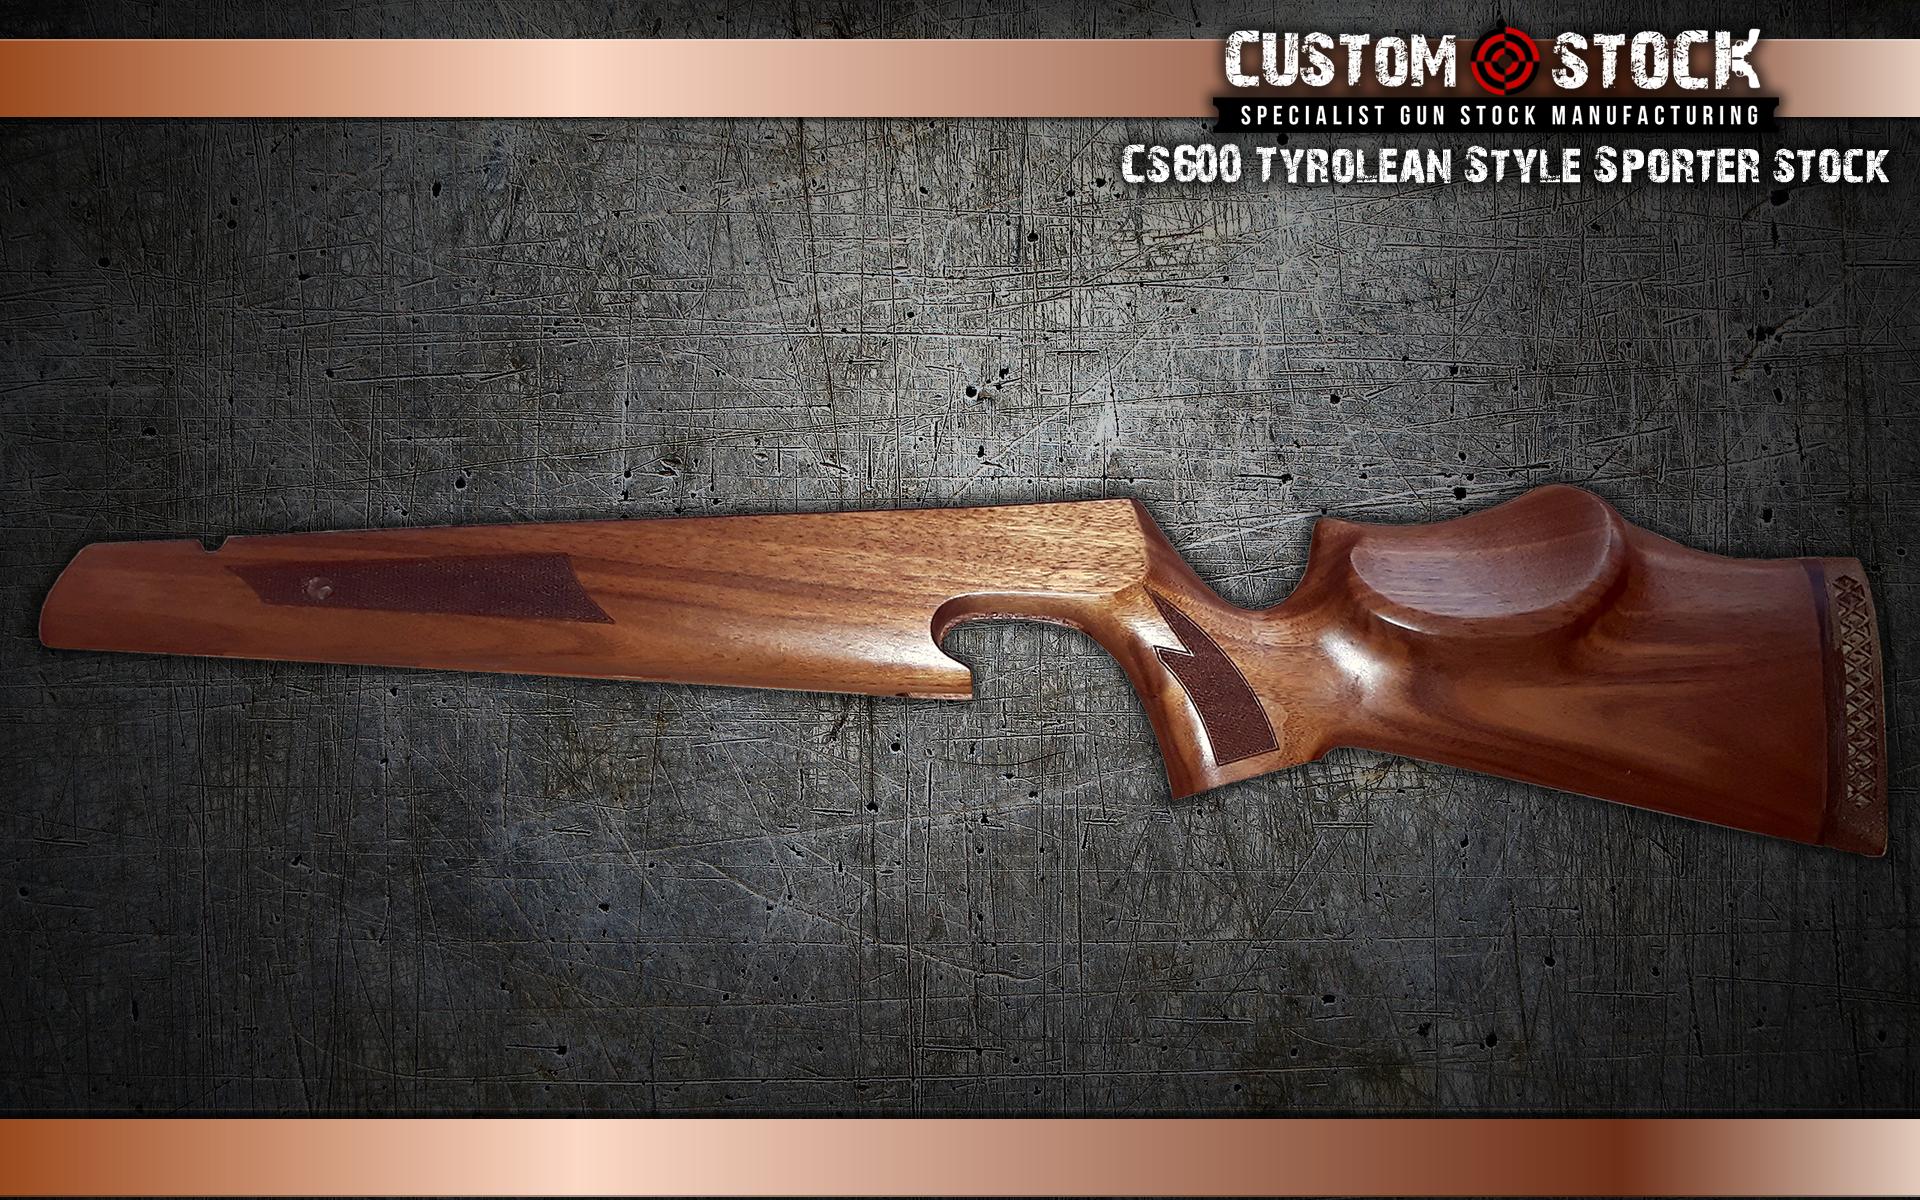 CS6 Tyrolean Style Sporter stock – Custom Stock LTD